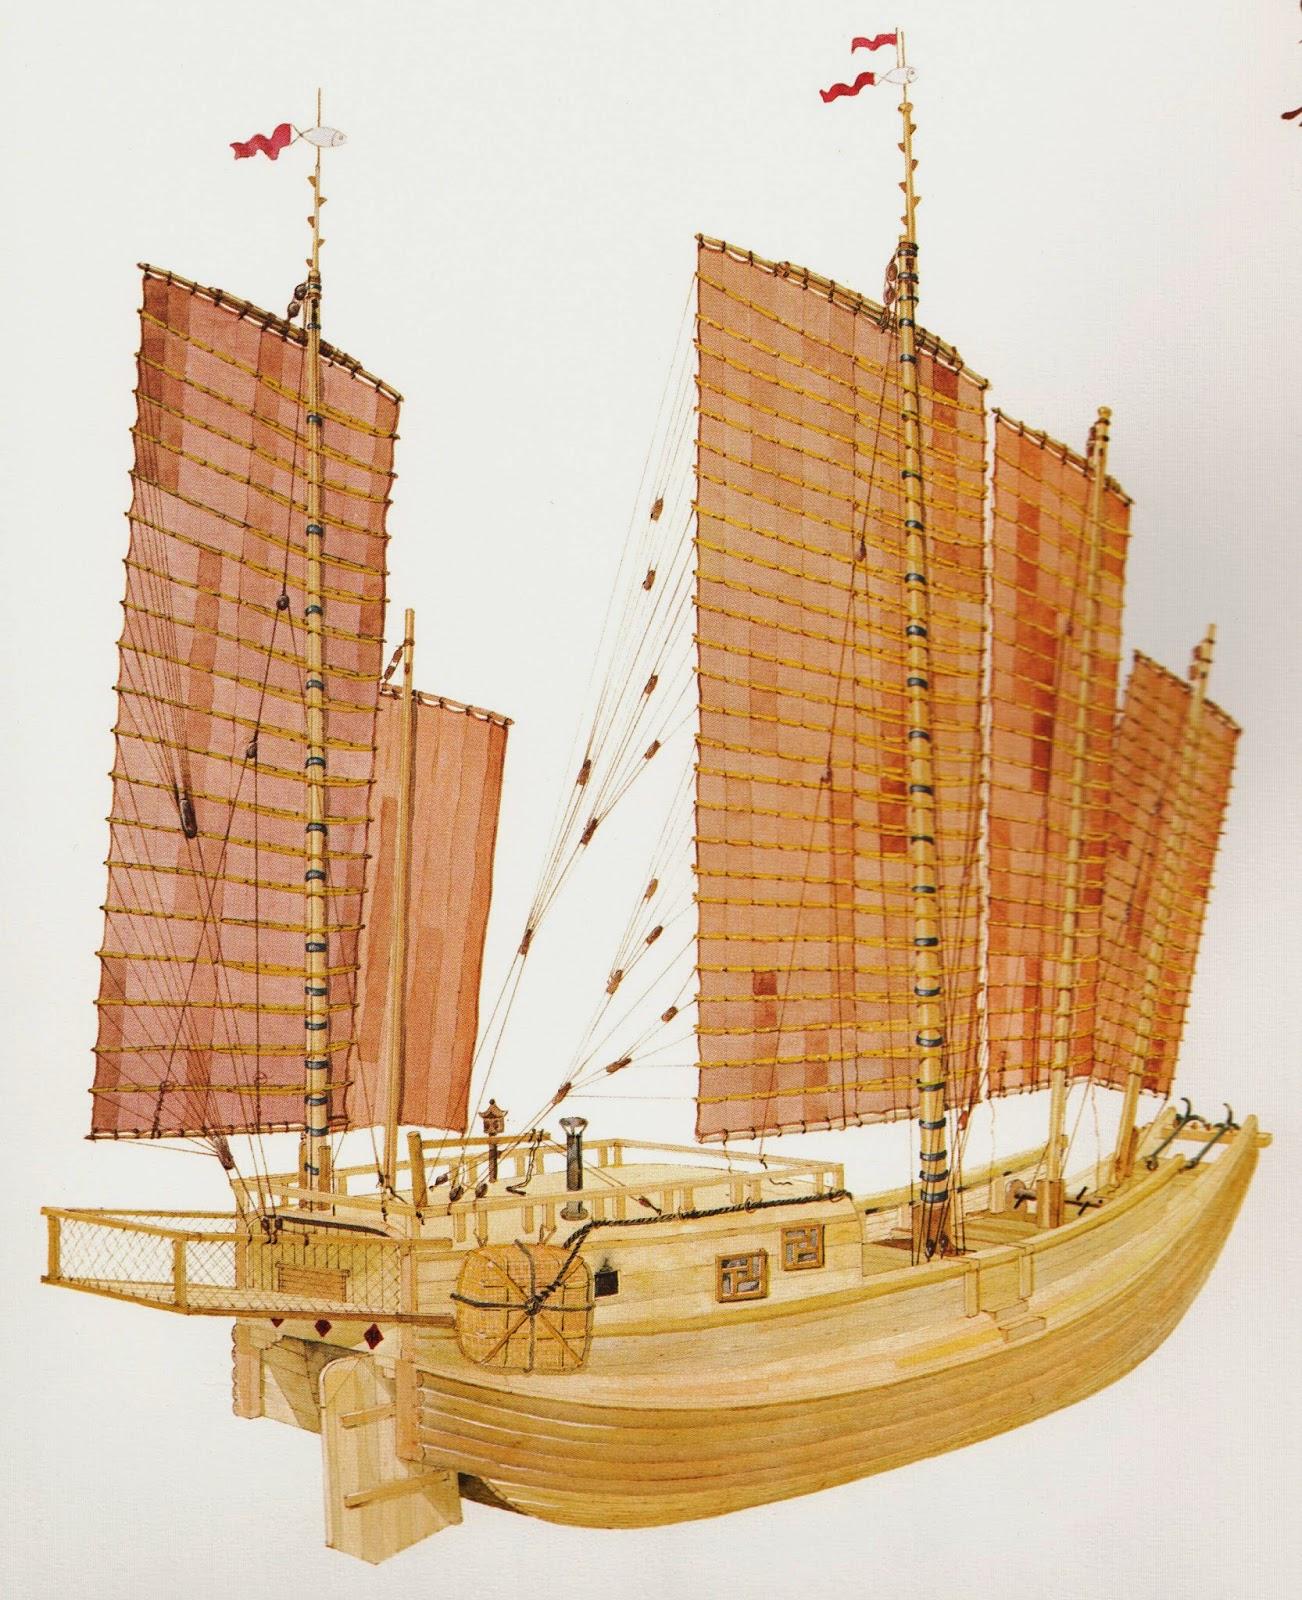 sha-ch'uan or sand boat